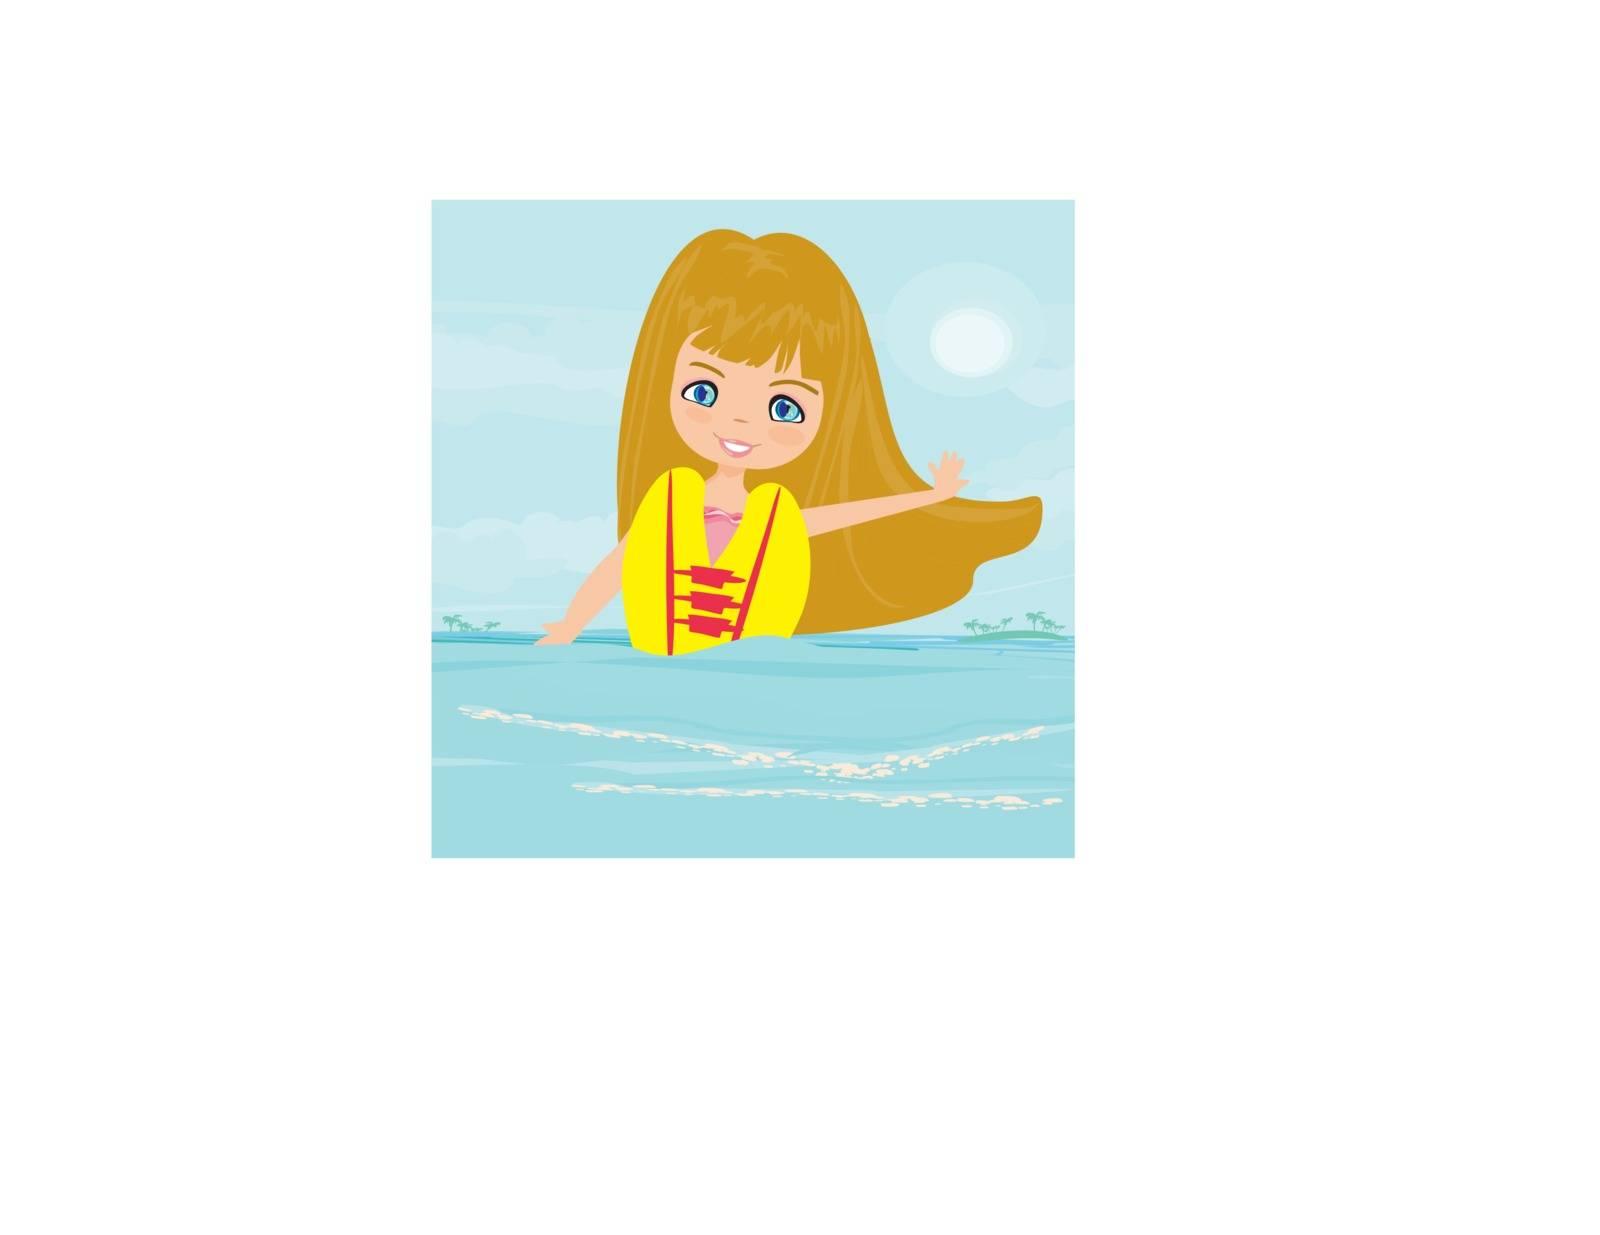 Happy girl in lifejacket